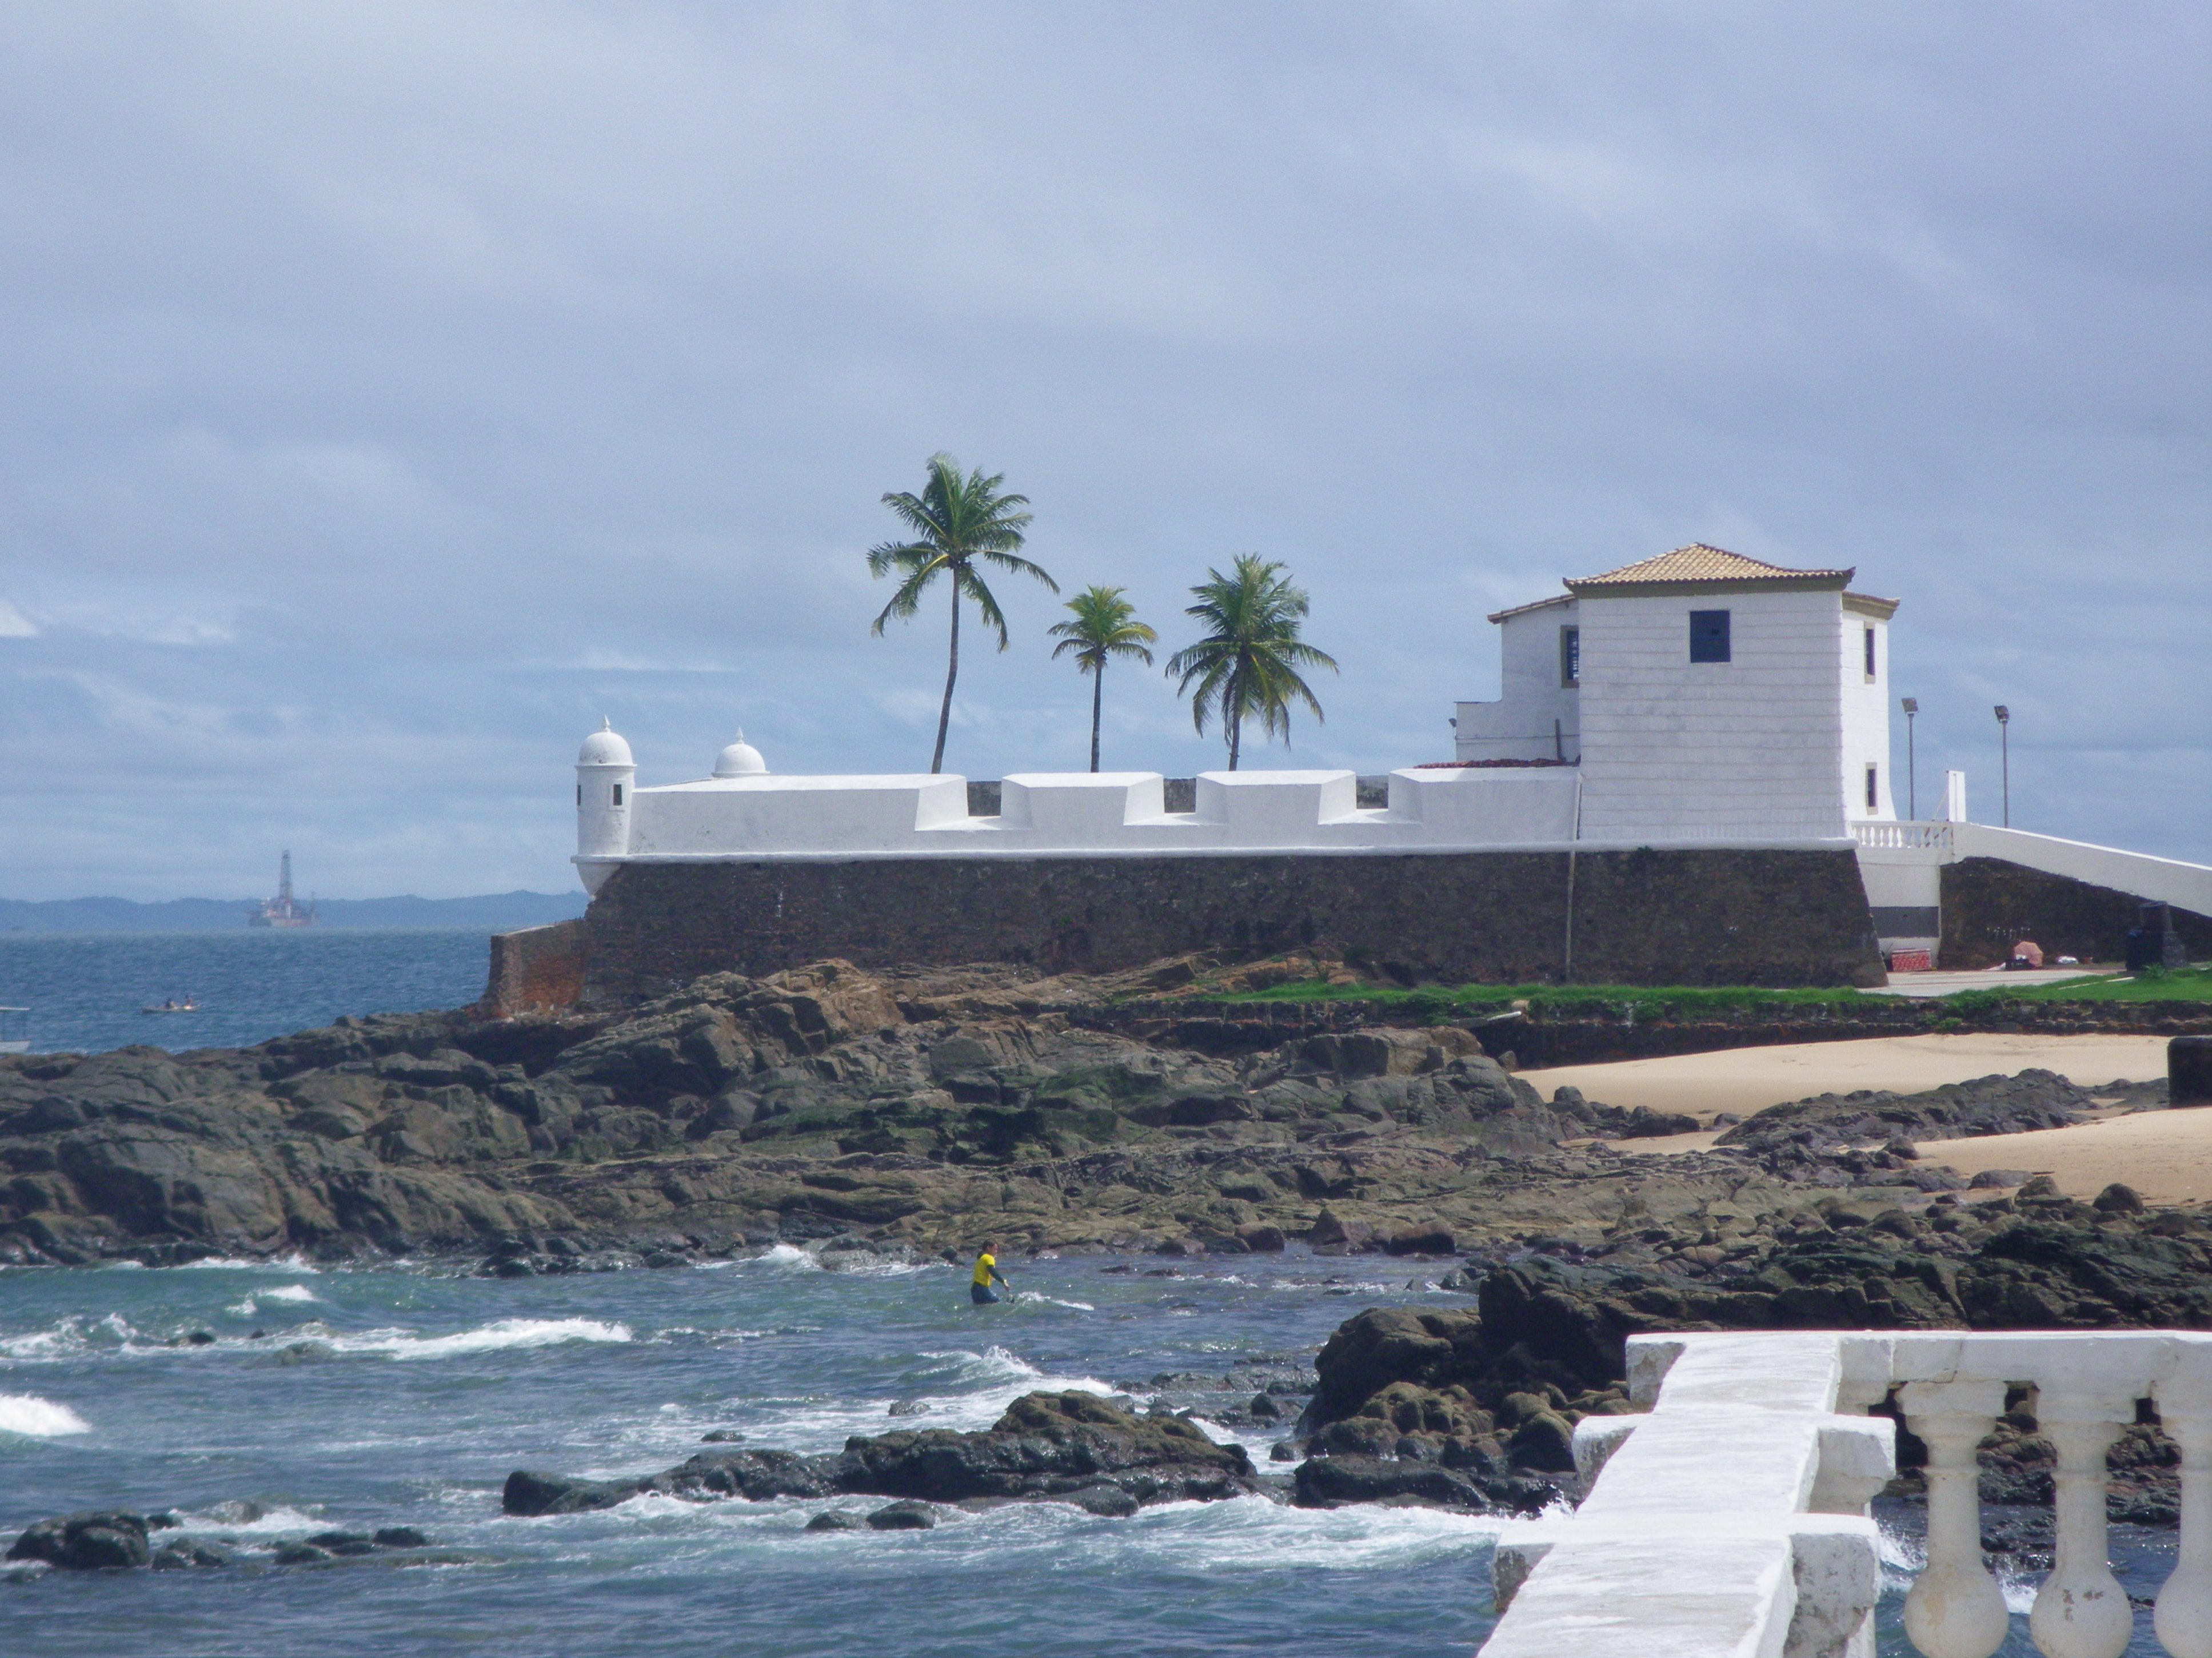 Bahia Festung